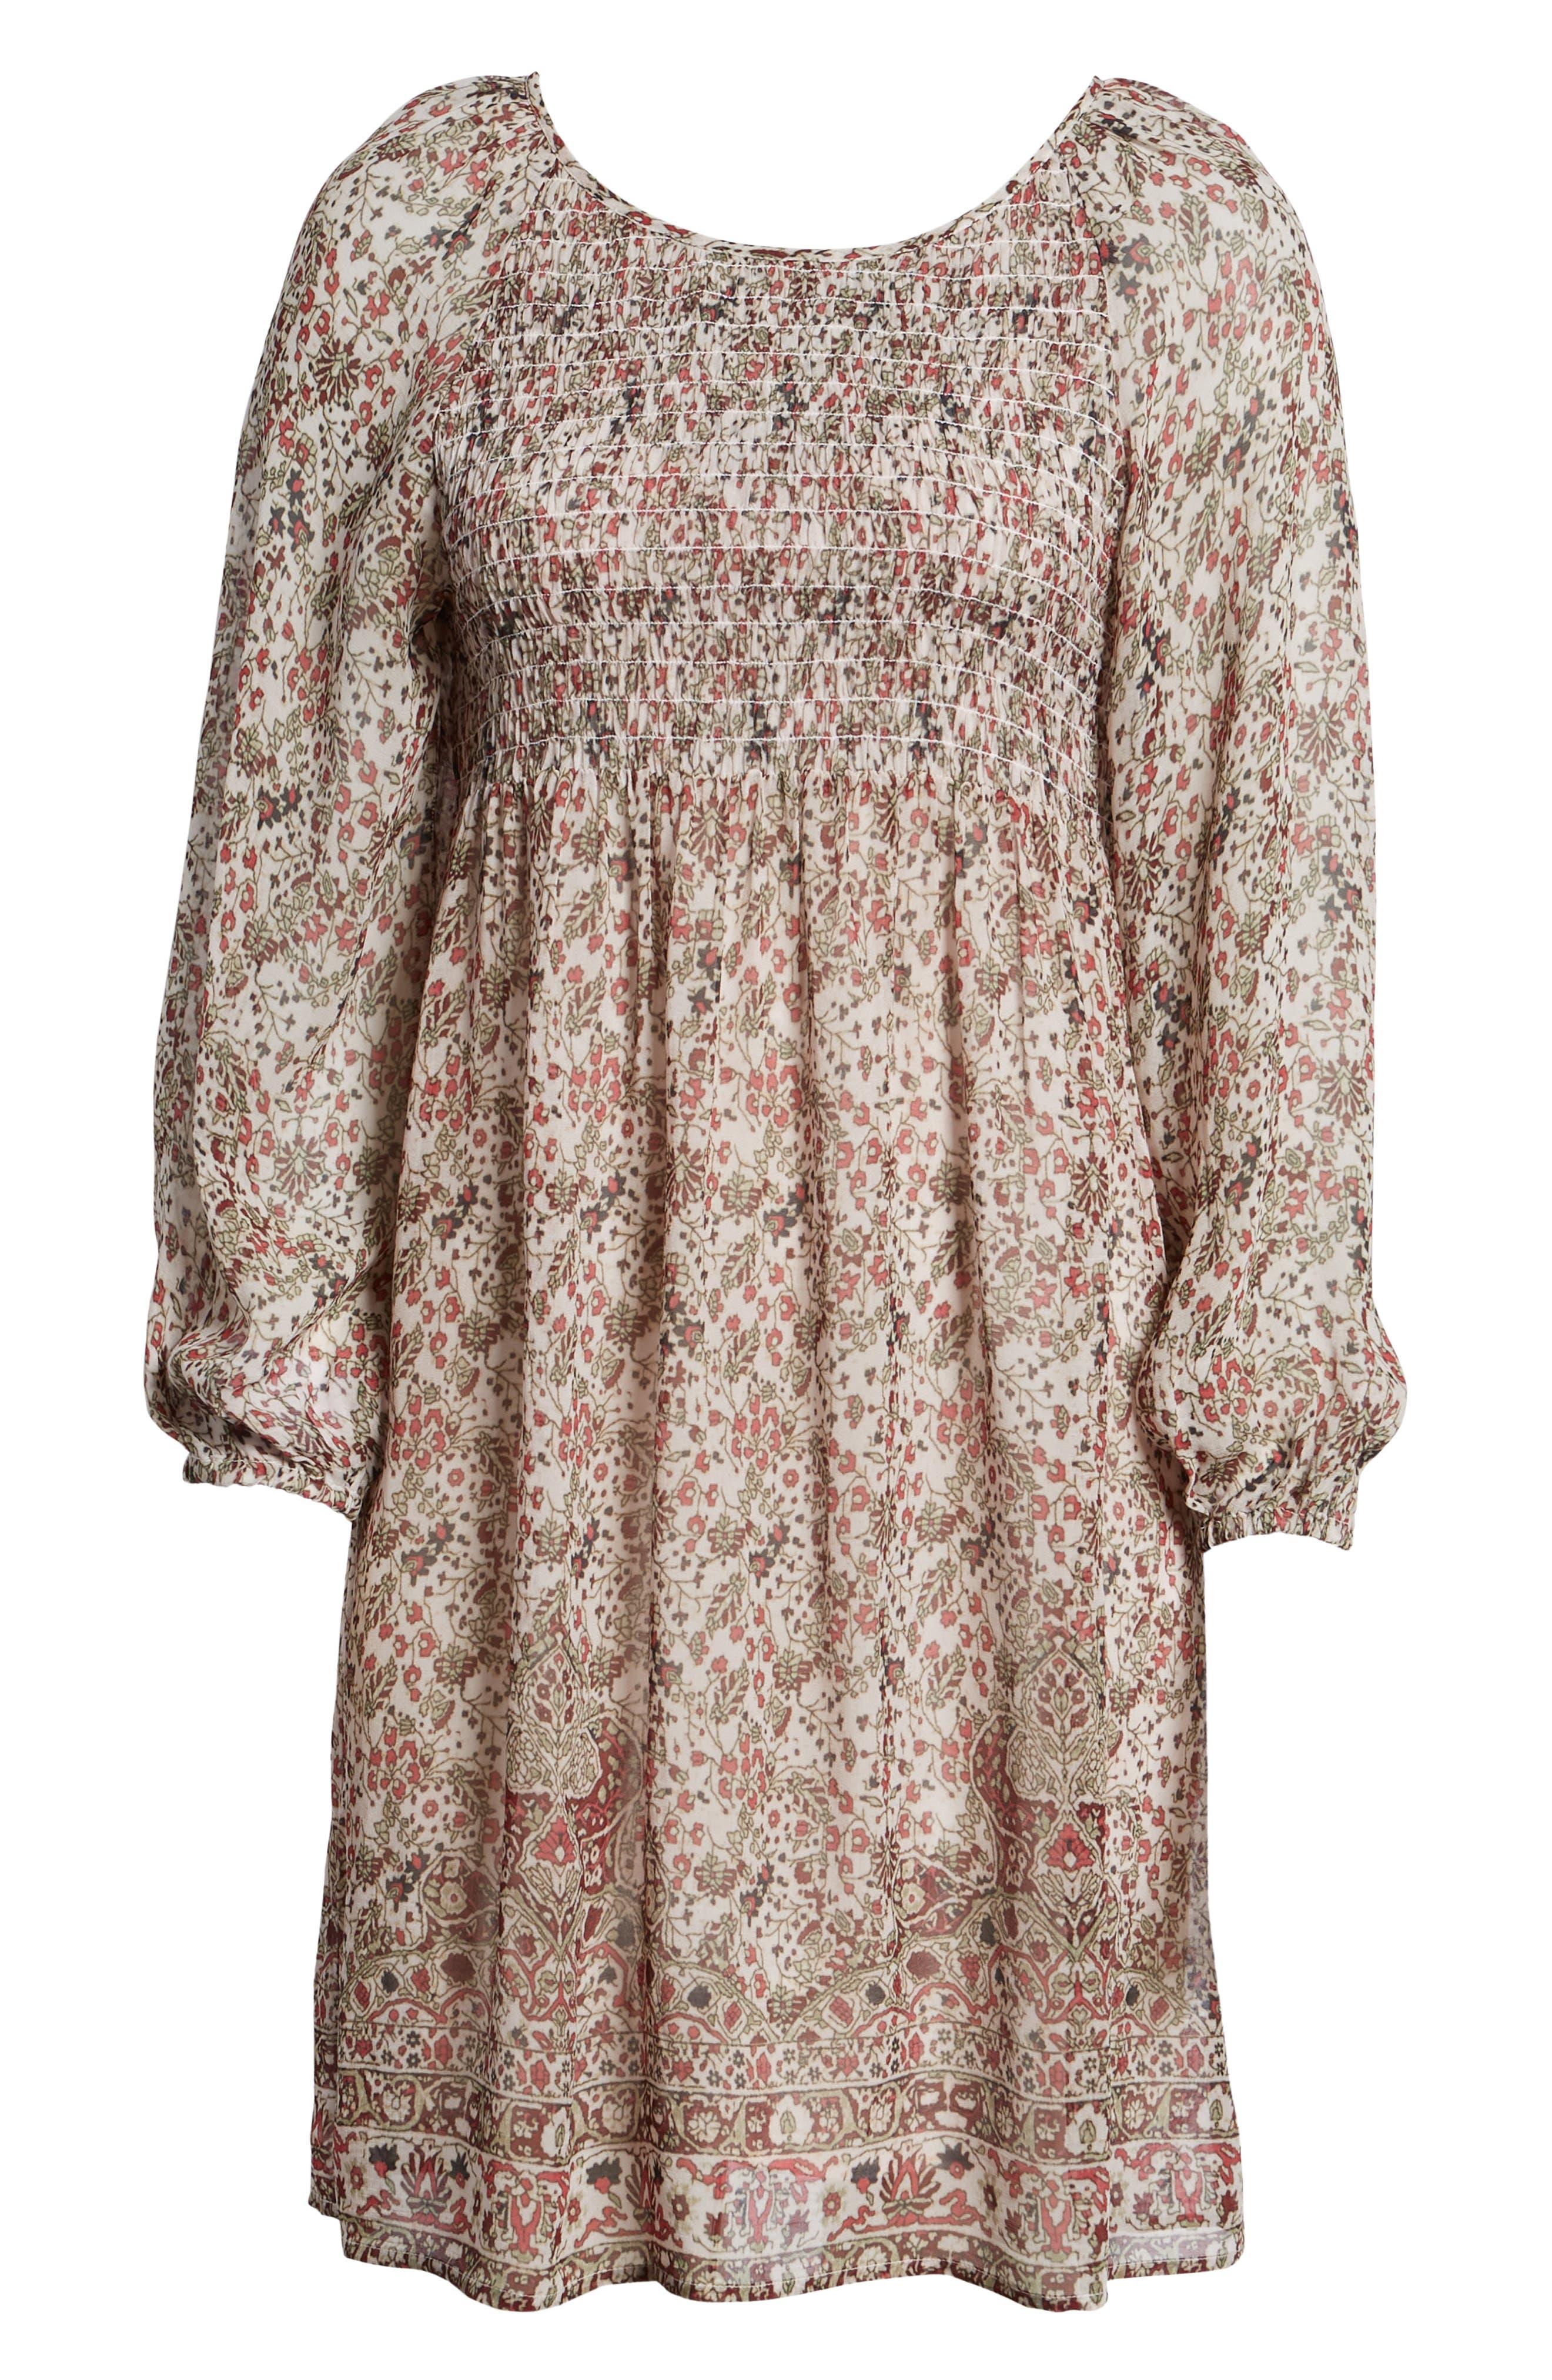 Sebastian Printed Smocked Dress,                             Alternate thumbnail 6, color,                             696